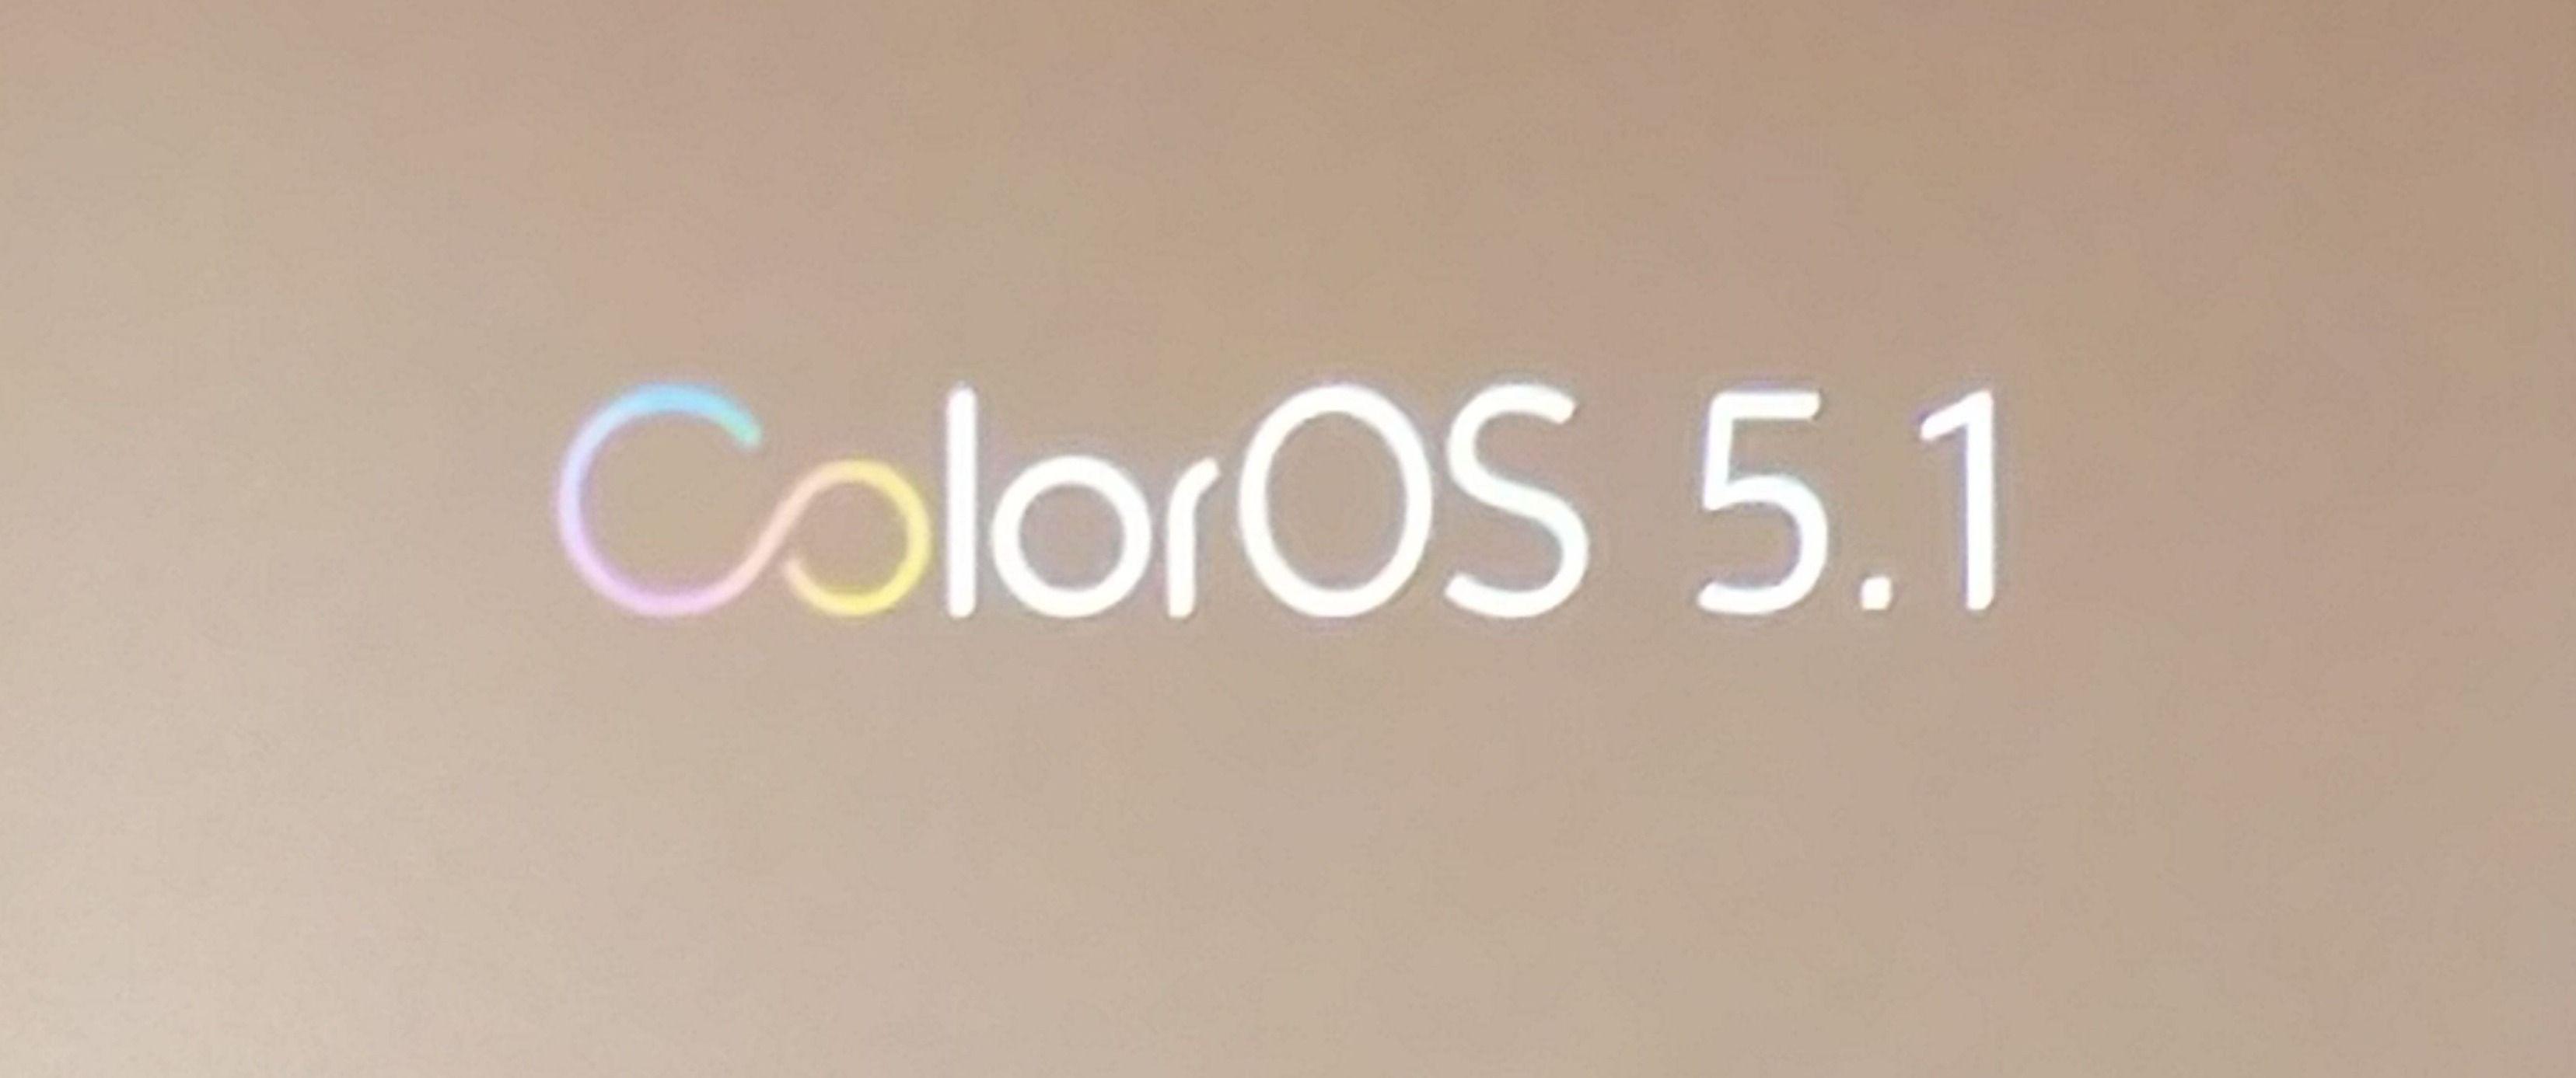 「Find X」体験イベント_ColerOS 5.1